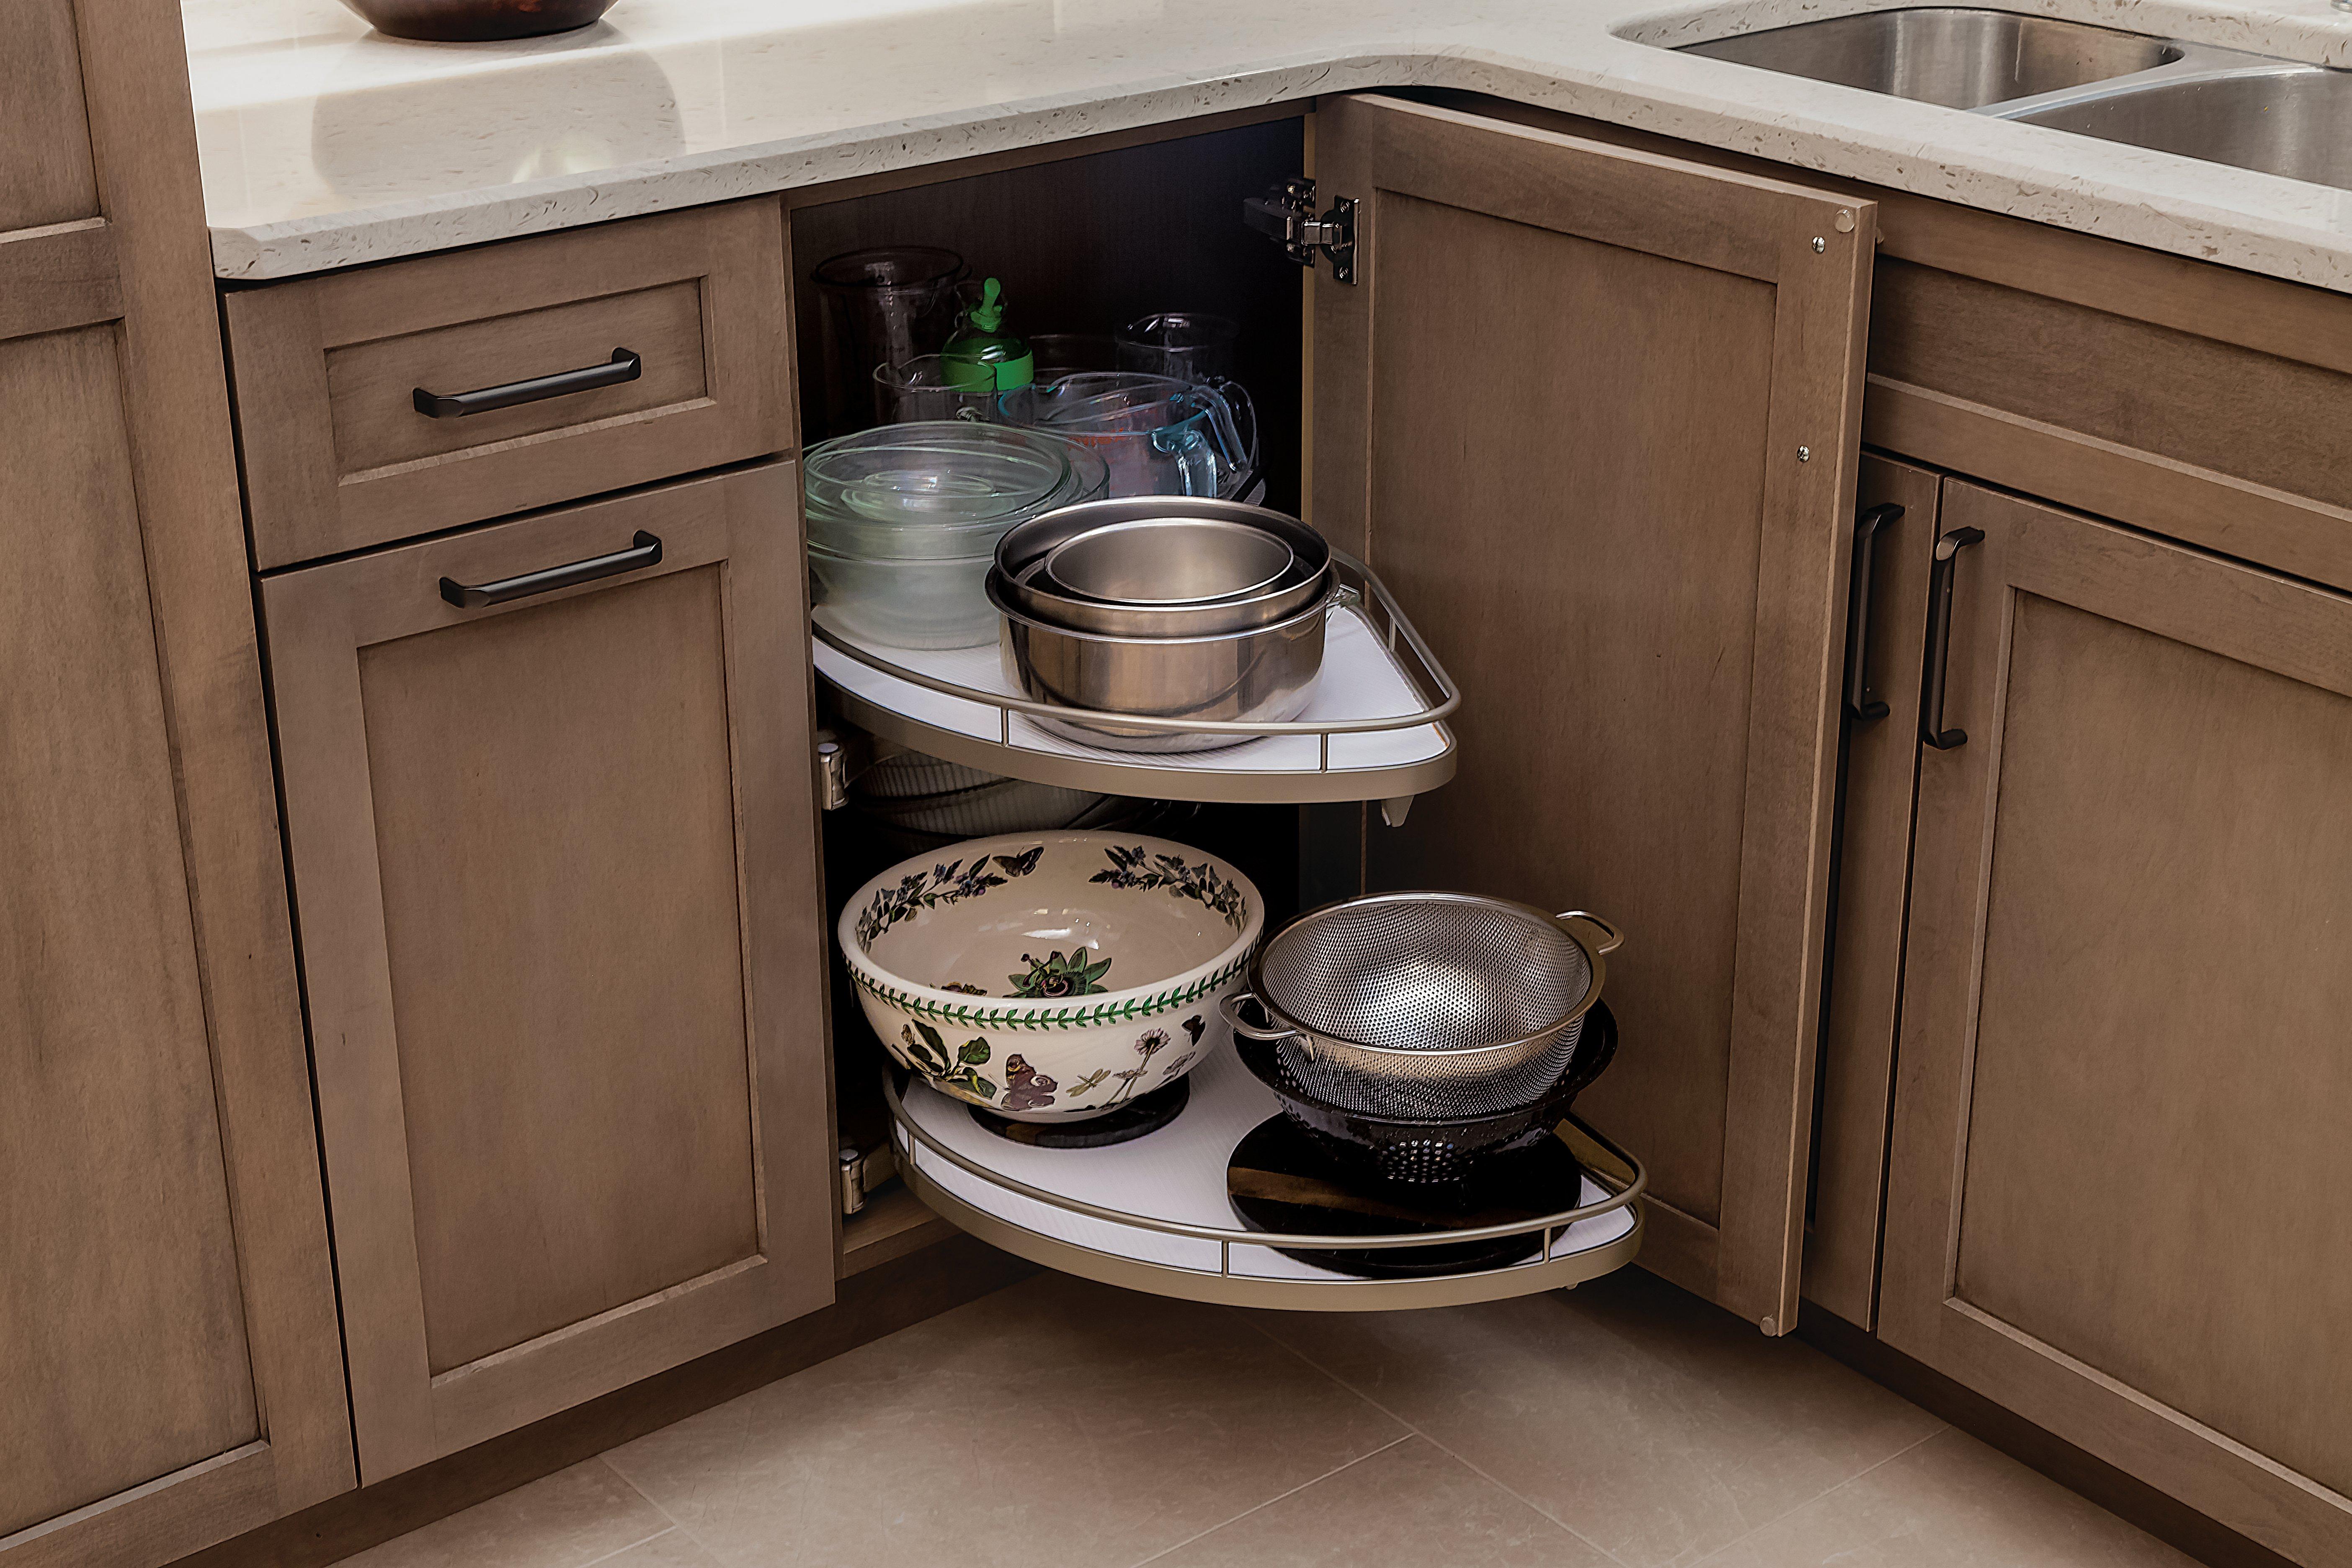 Dura supreme_kitchen-cabinet-lazy susan-Hudson-Cashew-Corner Pullout